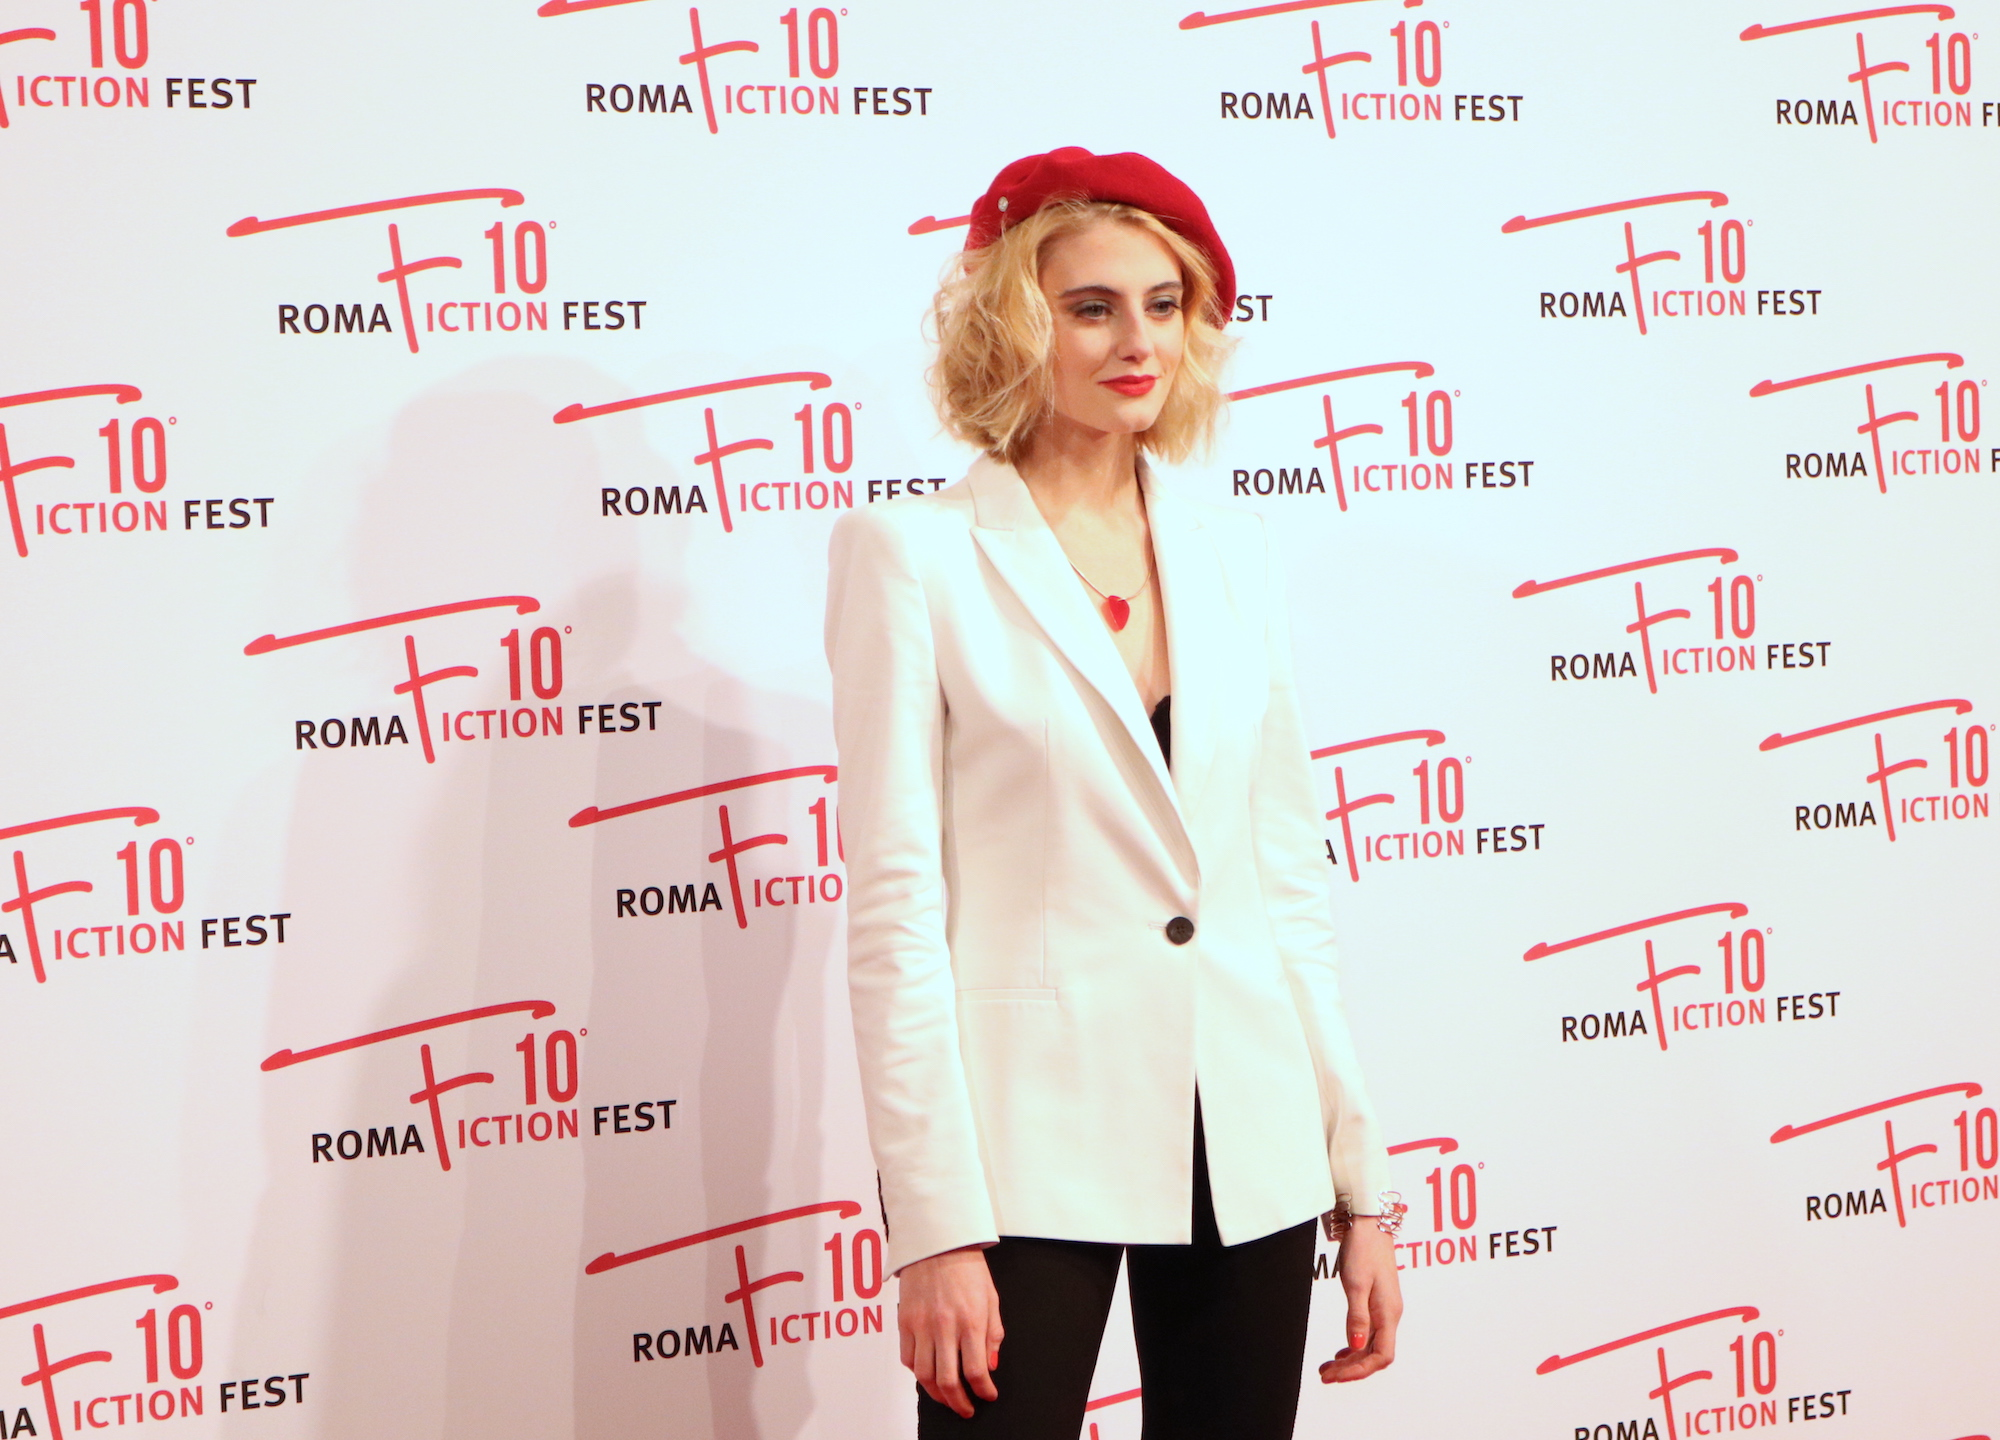 Roma Fiction Fest 2016: Demetra Bellina sul red carpet di Di padre in figlia